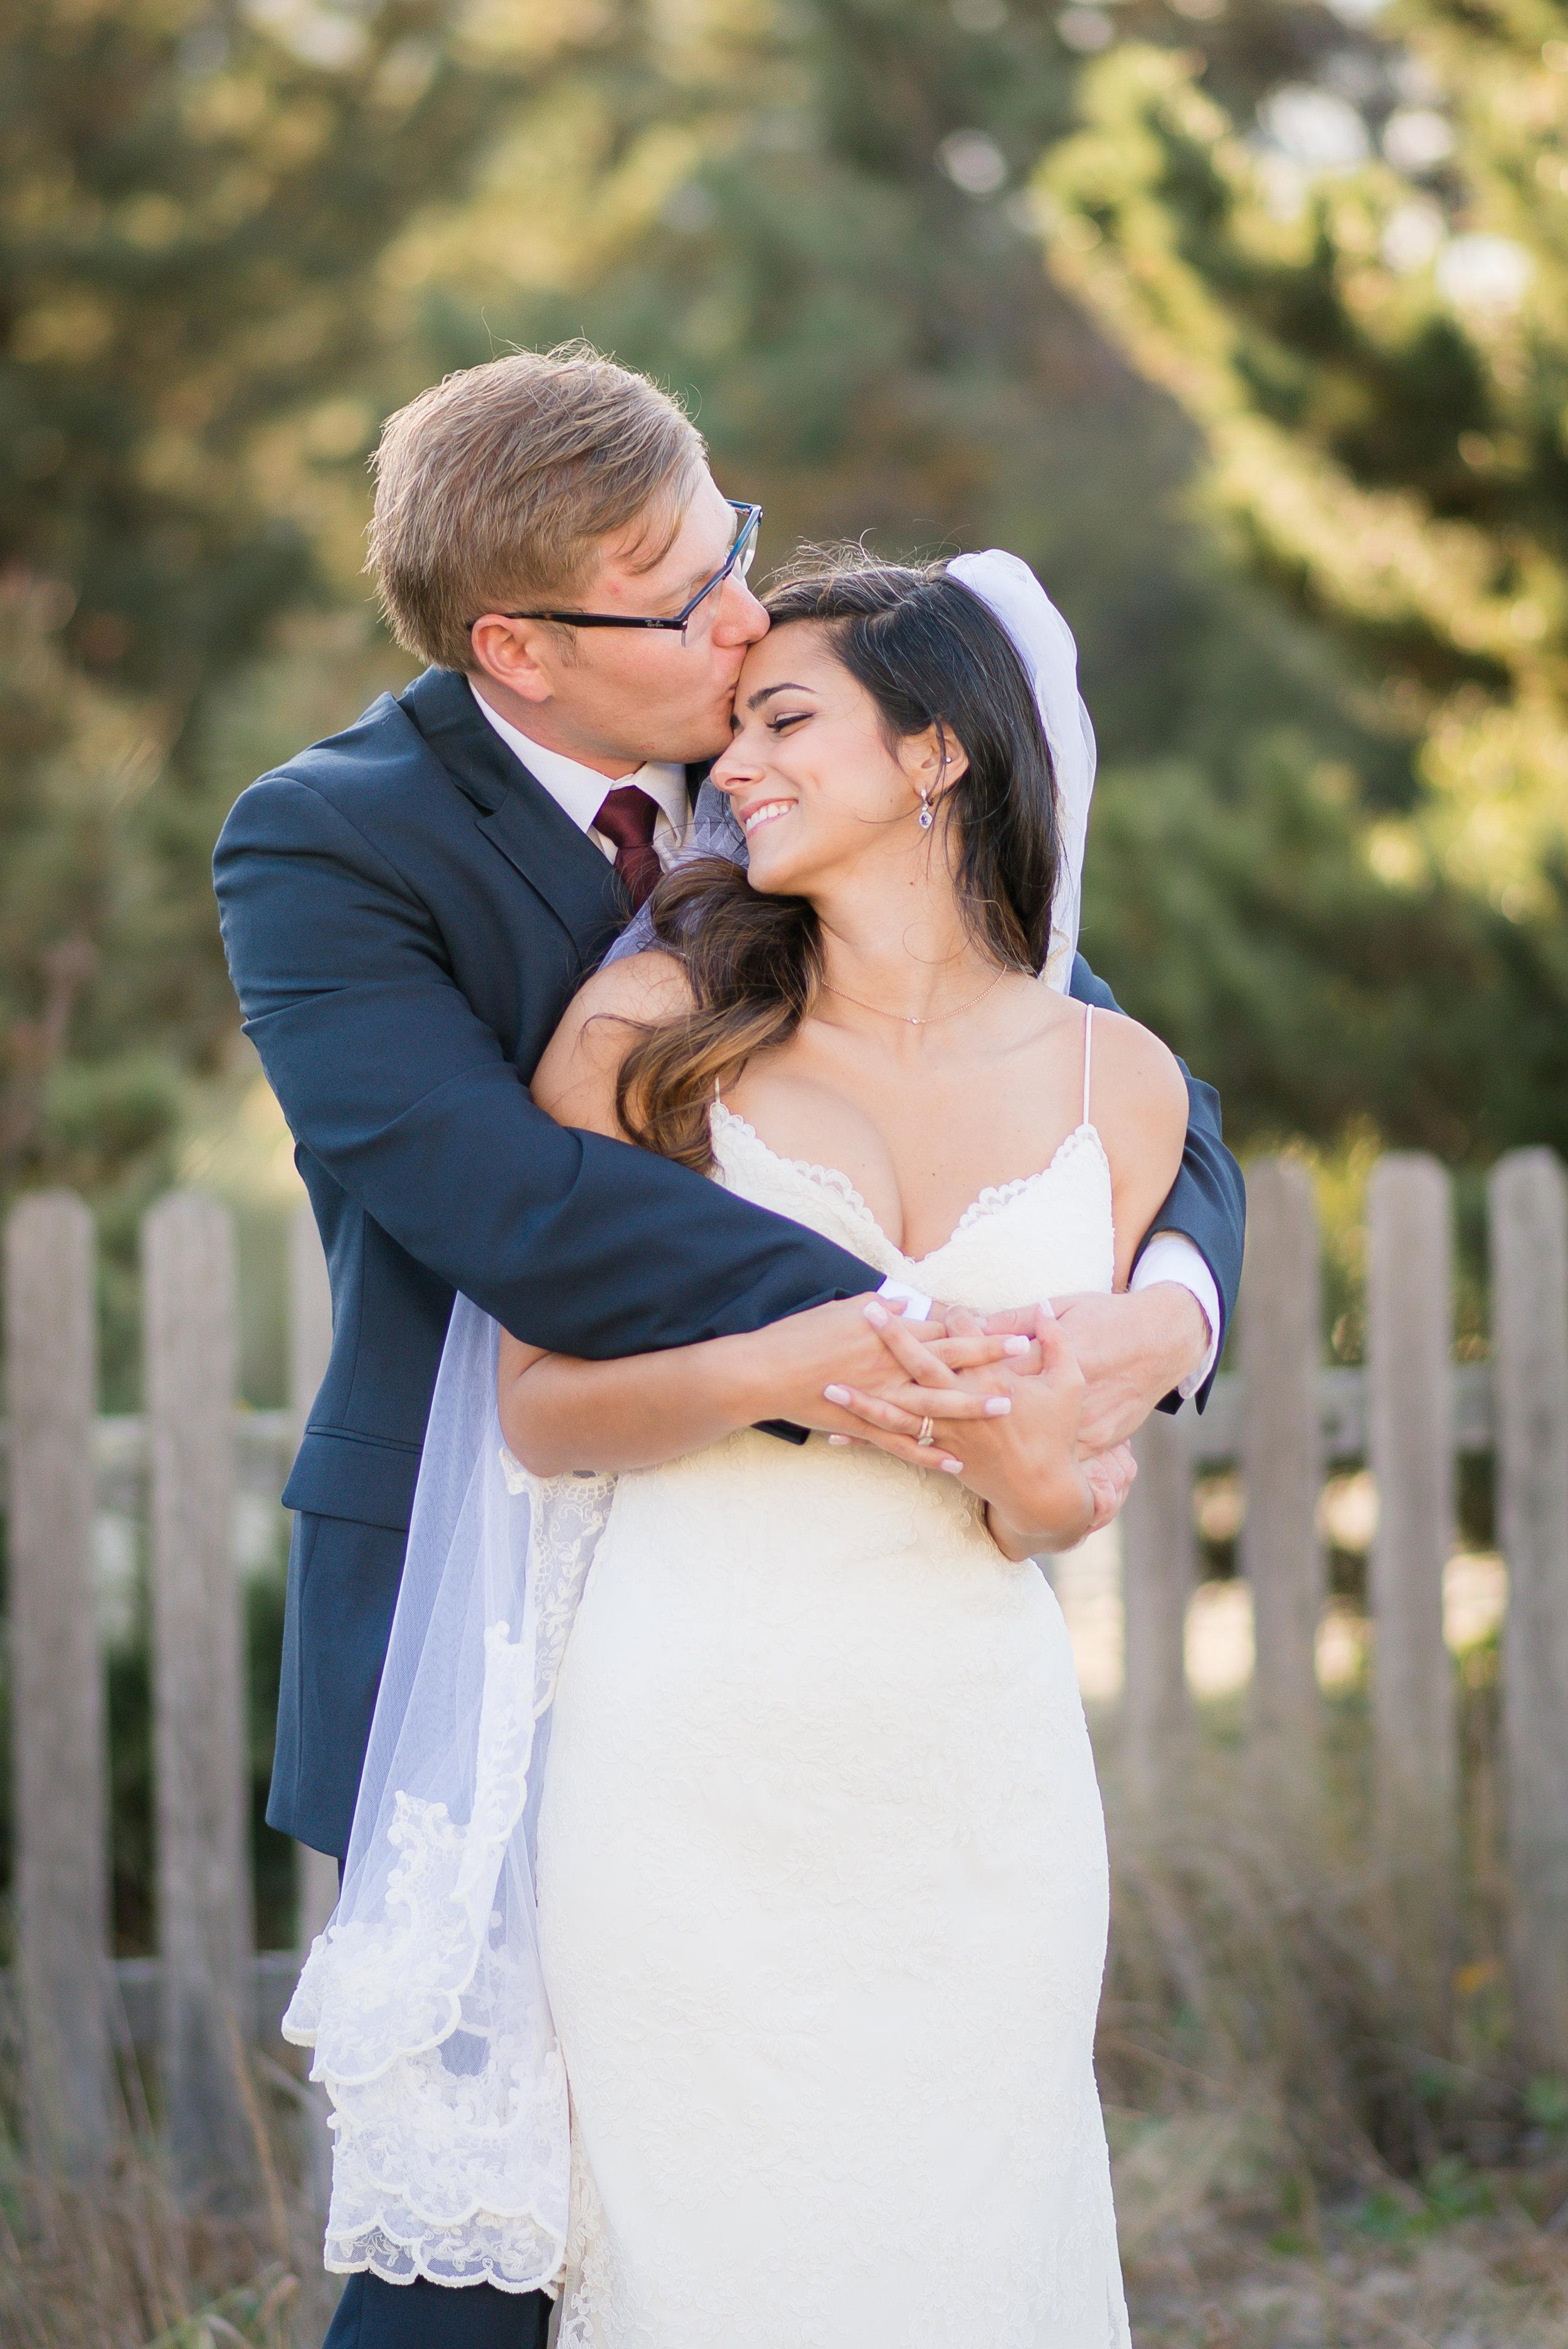 Erica + Robert Married430 copy.jpg